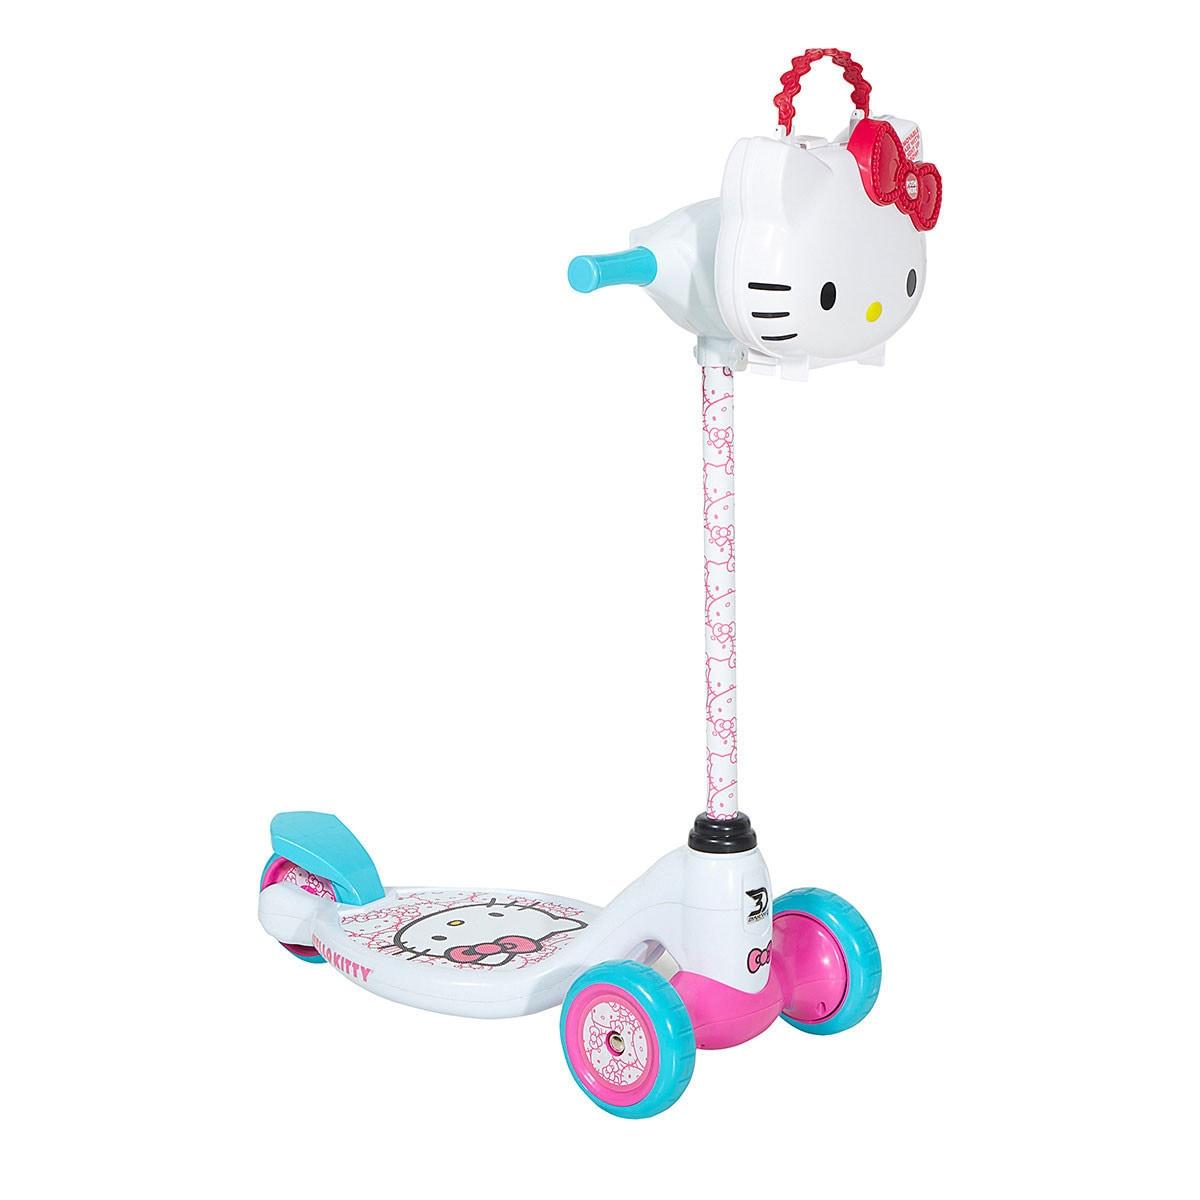 Dynacraft Hello Kitty 3-wheel Scooter, White